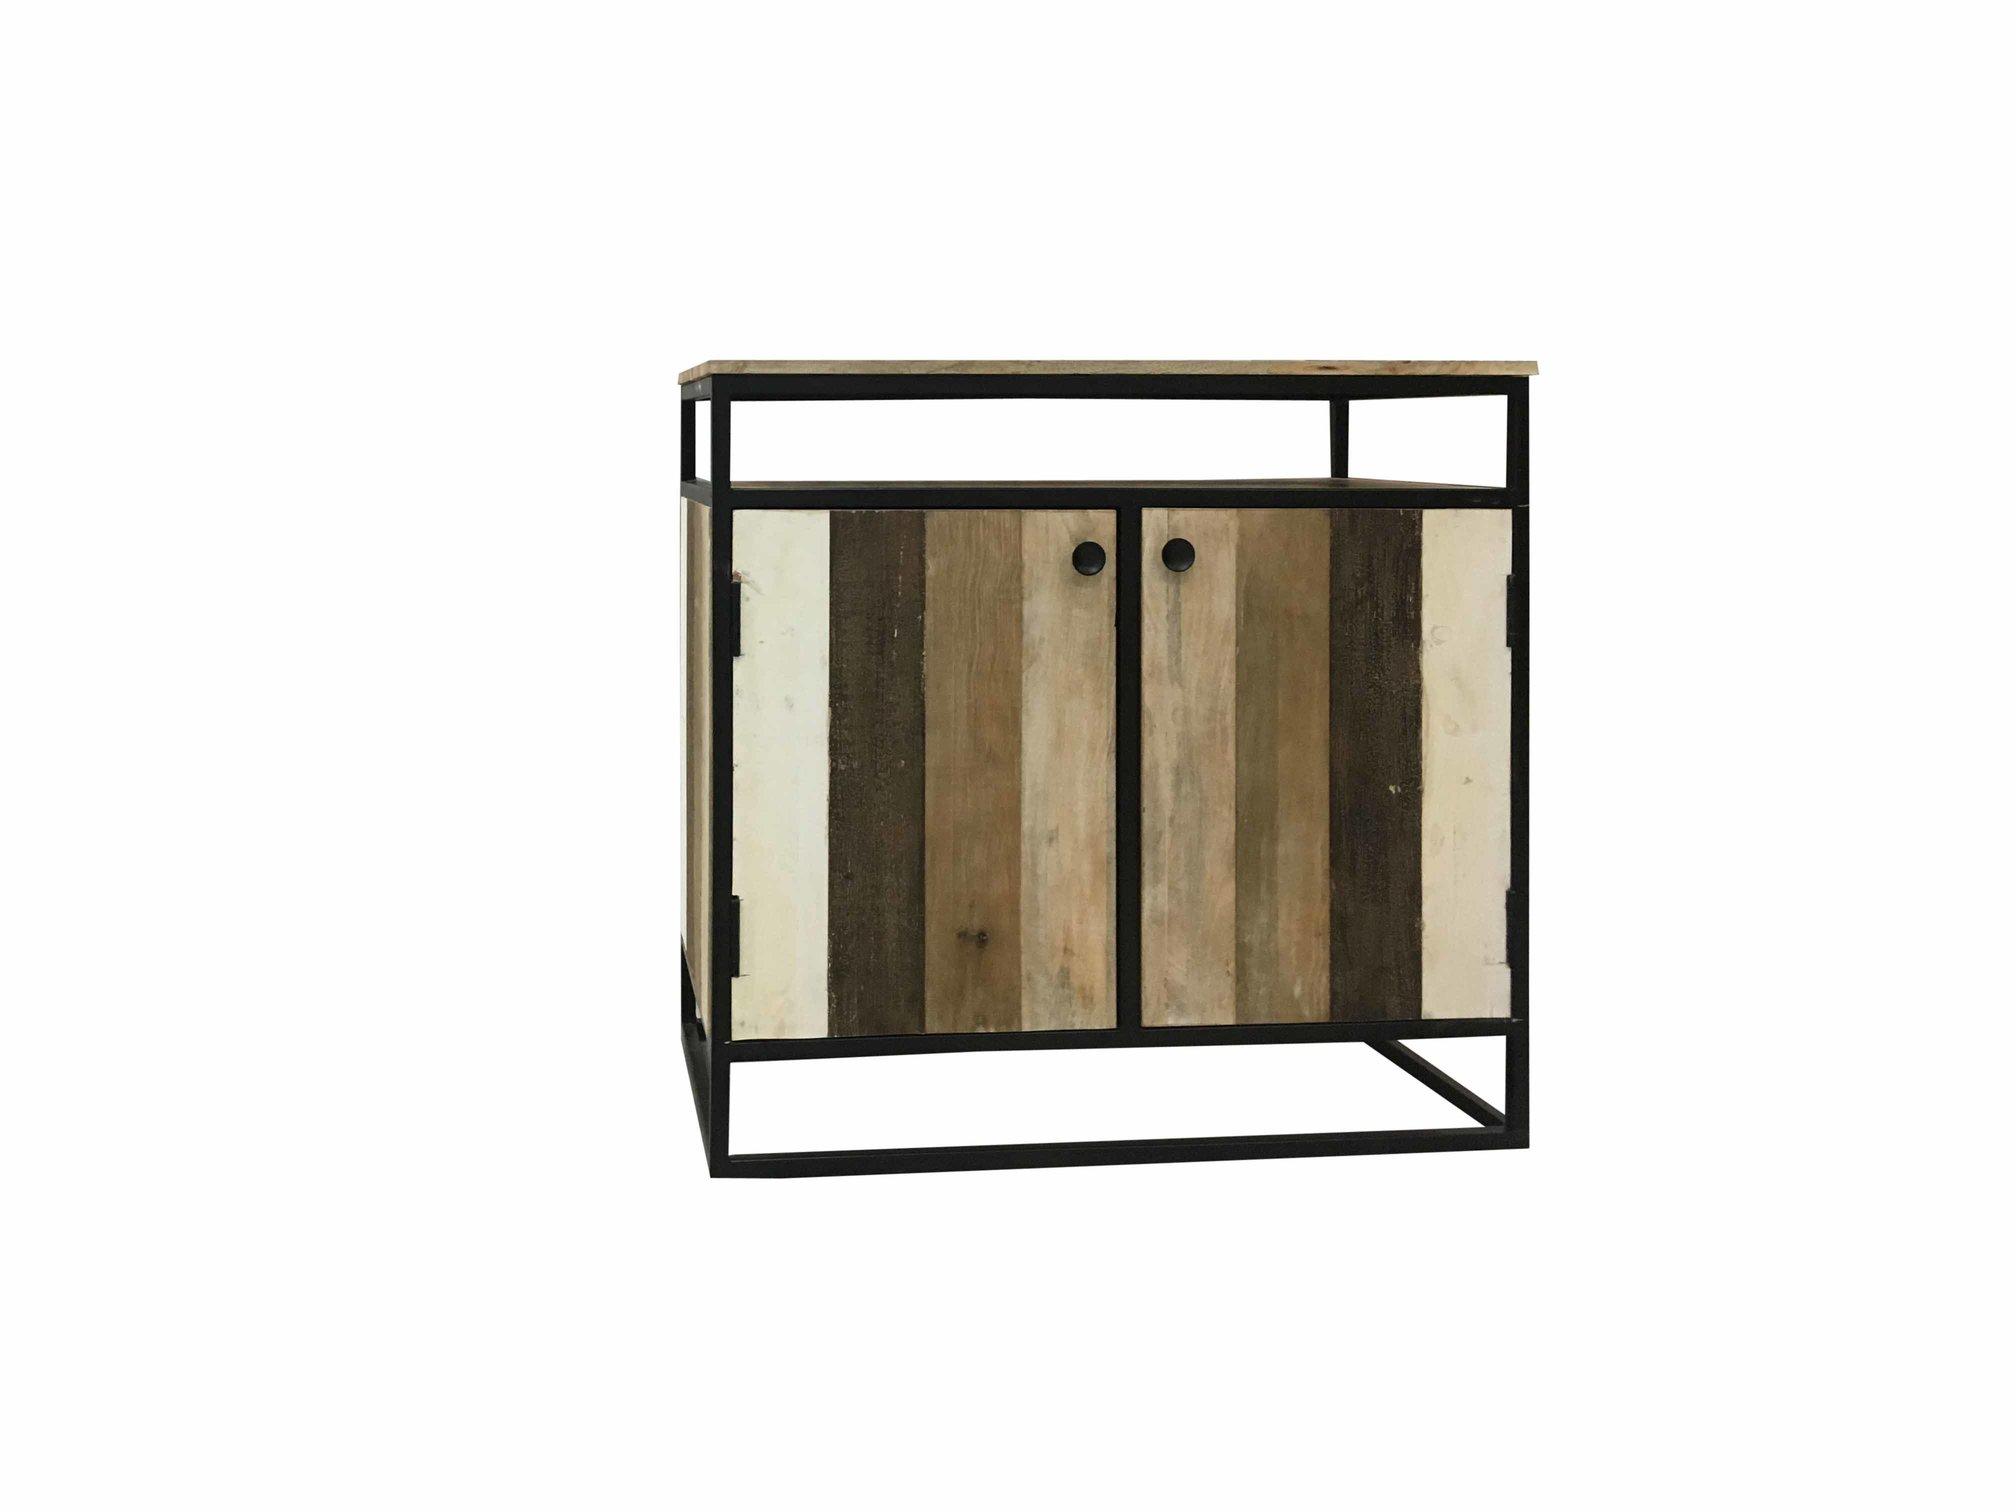 Metal Framed Reclaimed Wood Sideboards In Most Up To Date Industrial Reclaimed Mango Wood 2 Door Sideboard With Metal Frame (View 9 of 20)